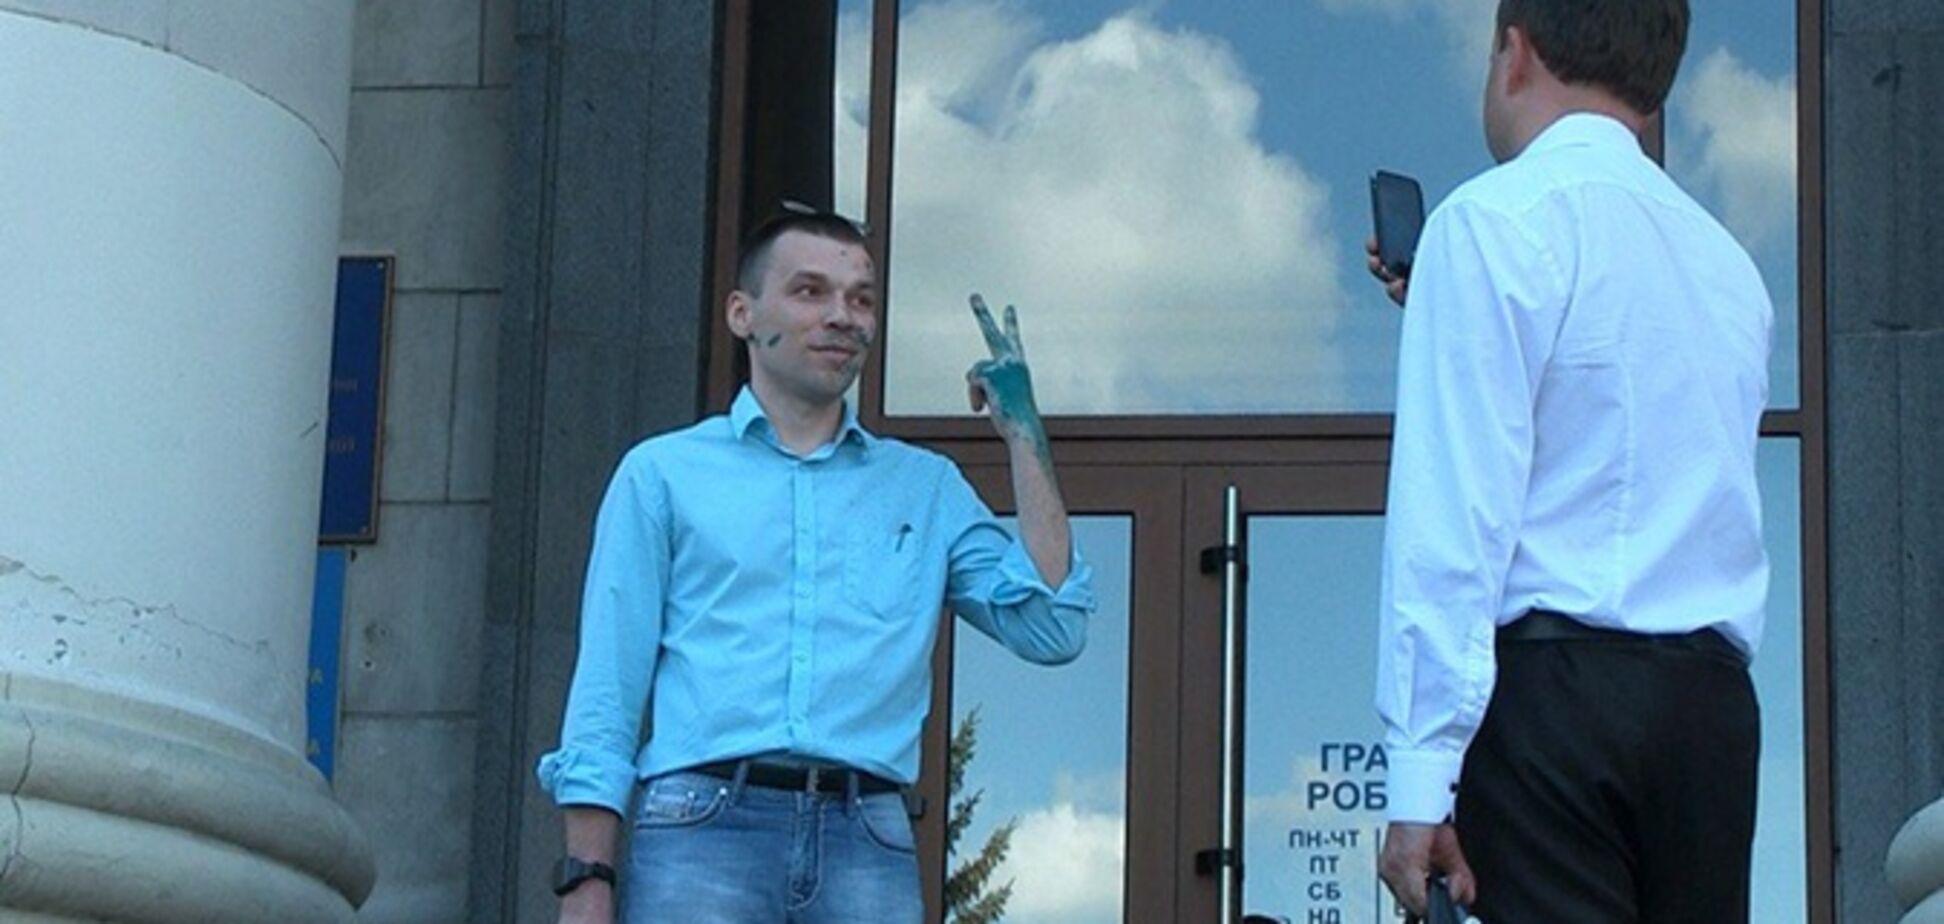 В Житомирі облили зеленкою скандального проросійського блогера